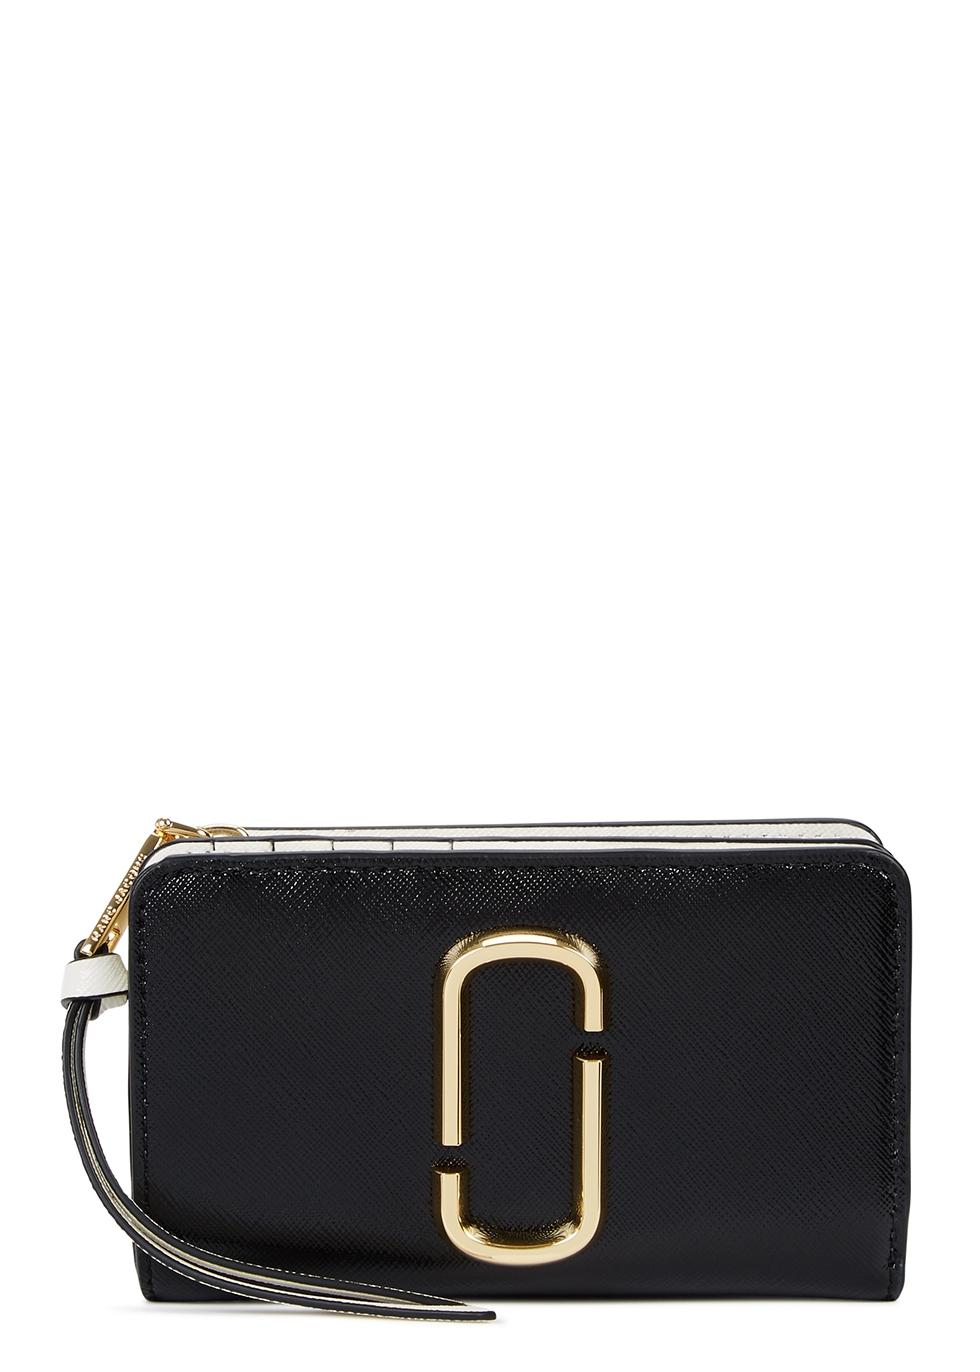 Women s Designer Purses and Wallets - Harvey Nichols 0e5e0c0185f7e